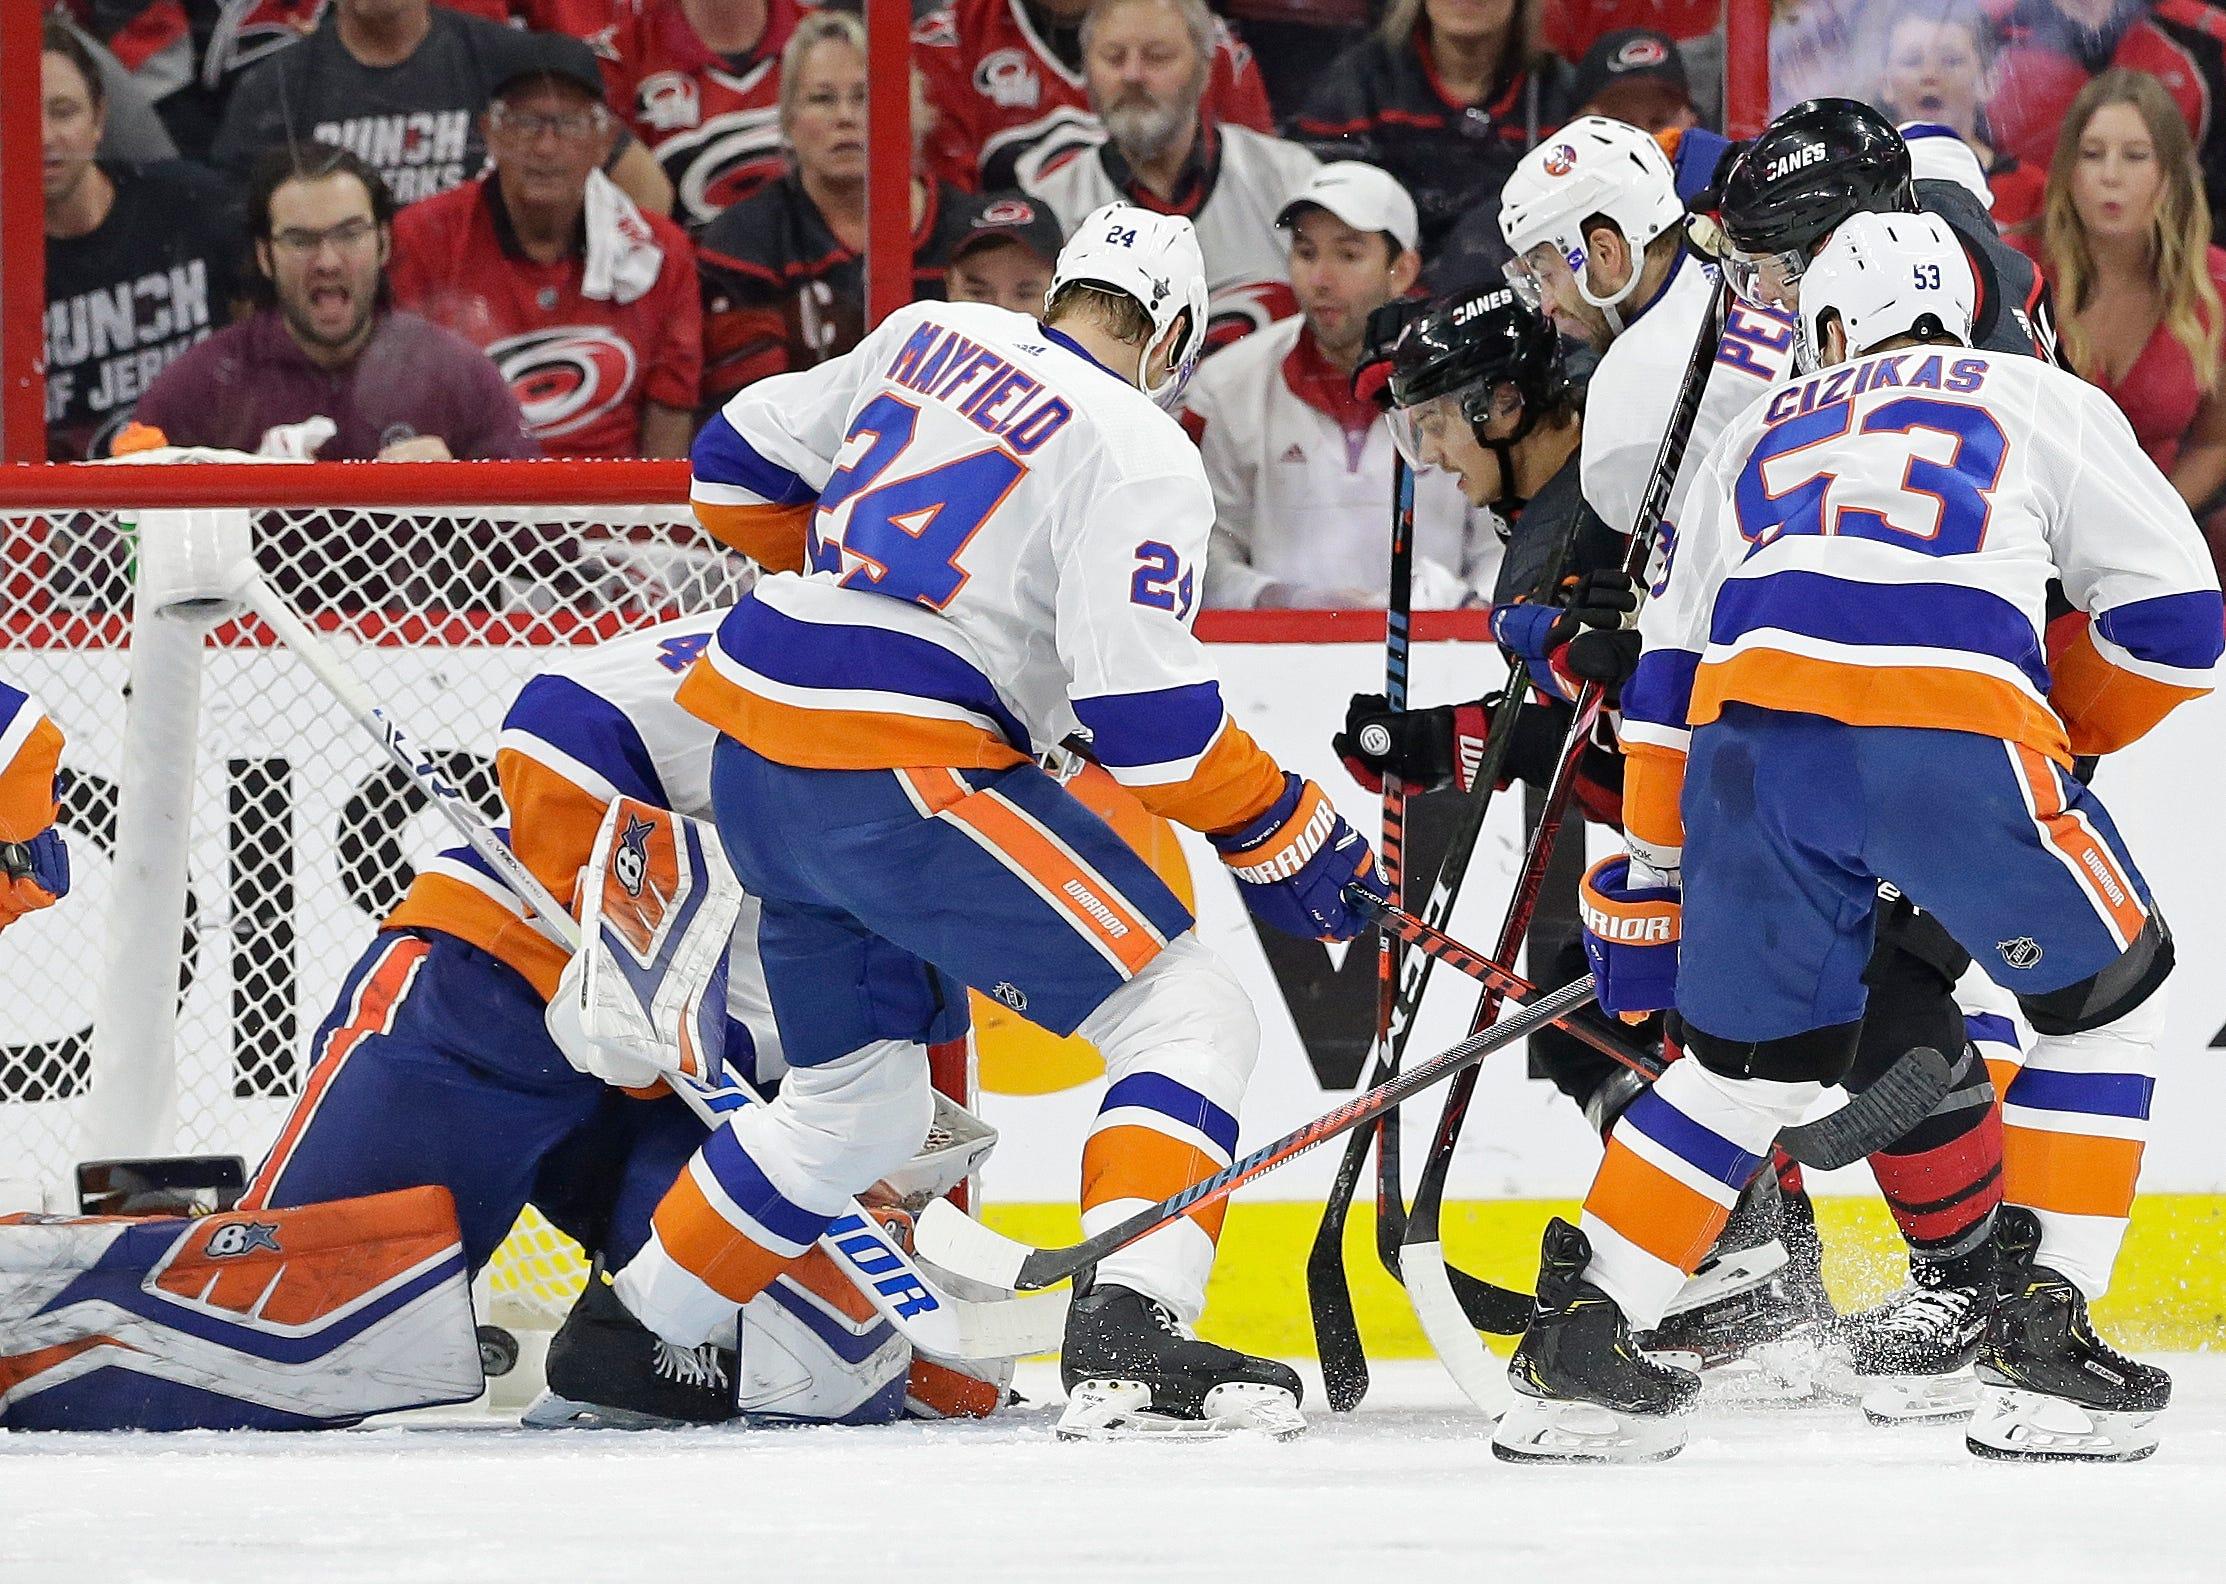 Goalie drama: Lehner out, Greiss in for Islanders